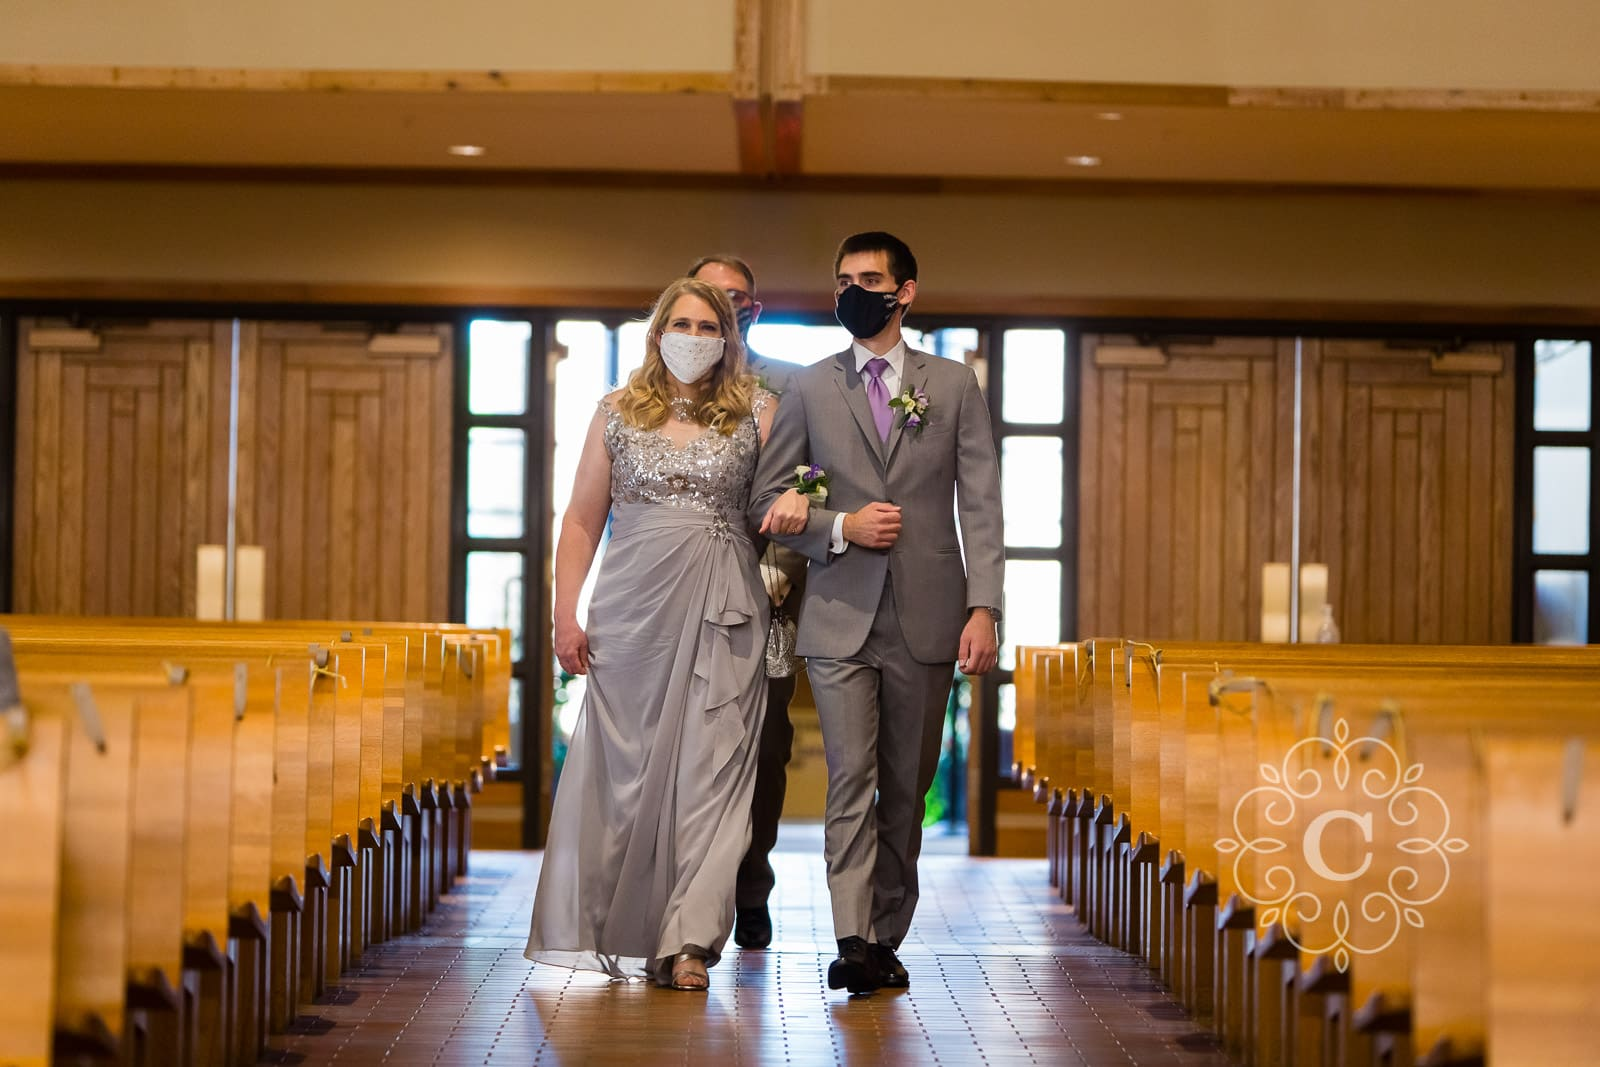 Catholic Church Wayzata MN Wedding Photos